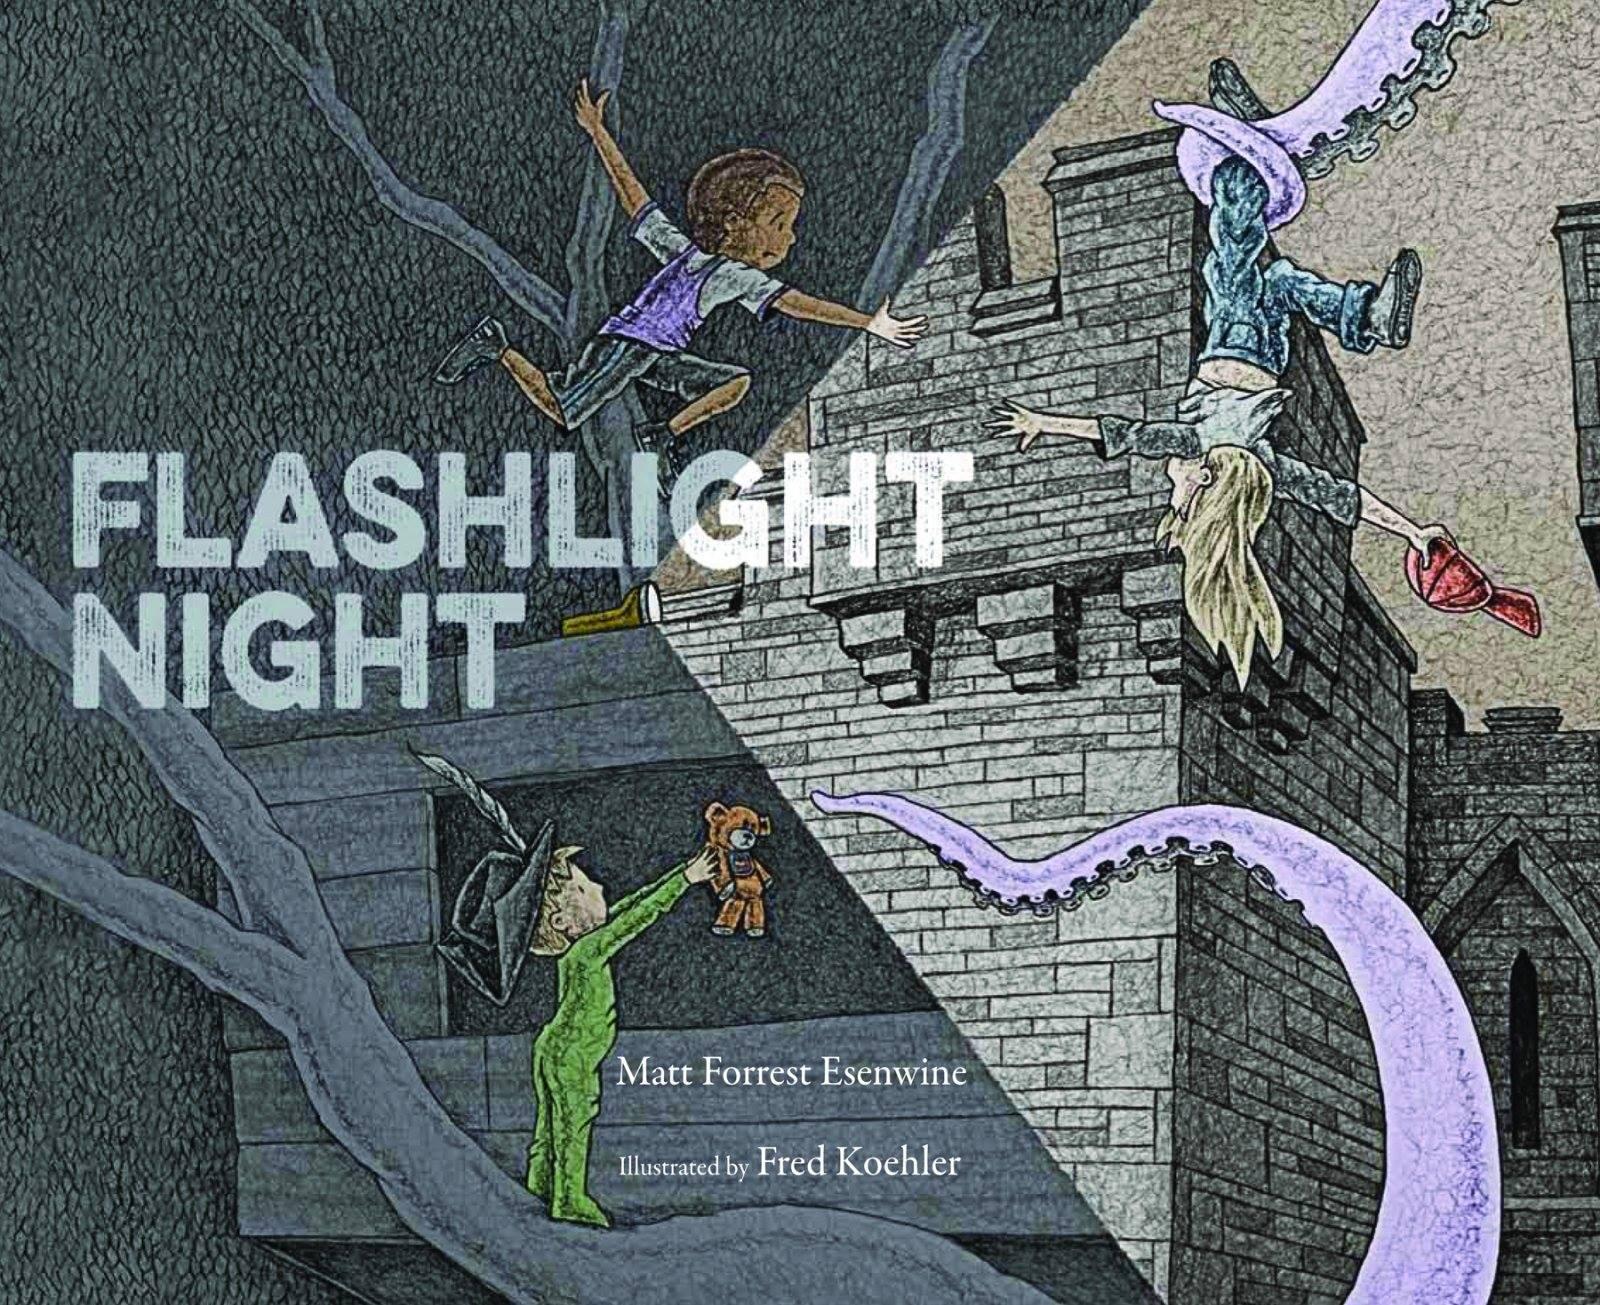 celebrate-picture-books-picture-book-review-flashlight-night-cover-2